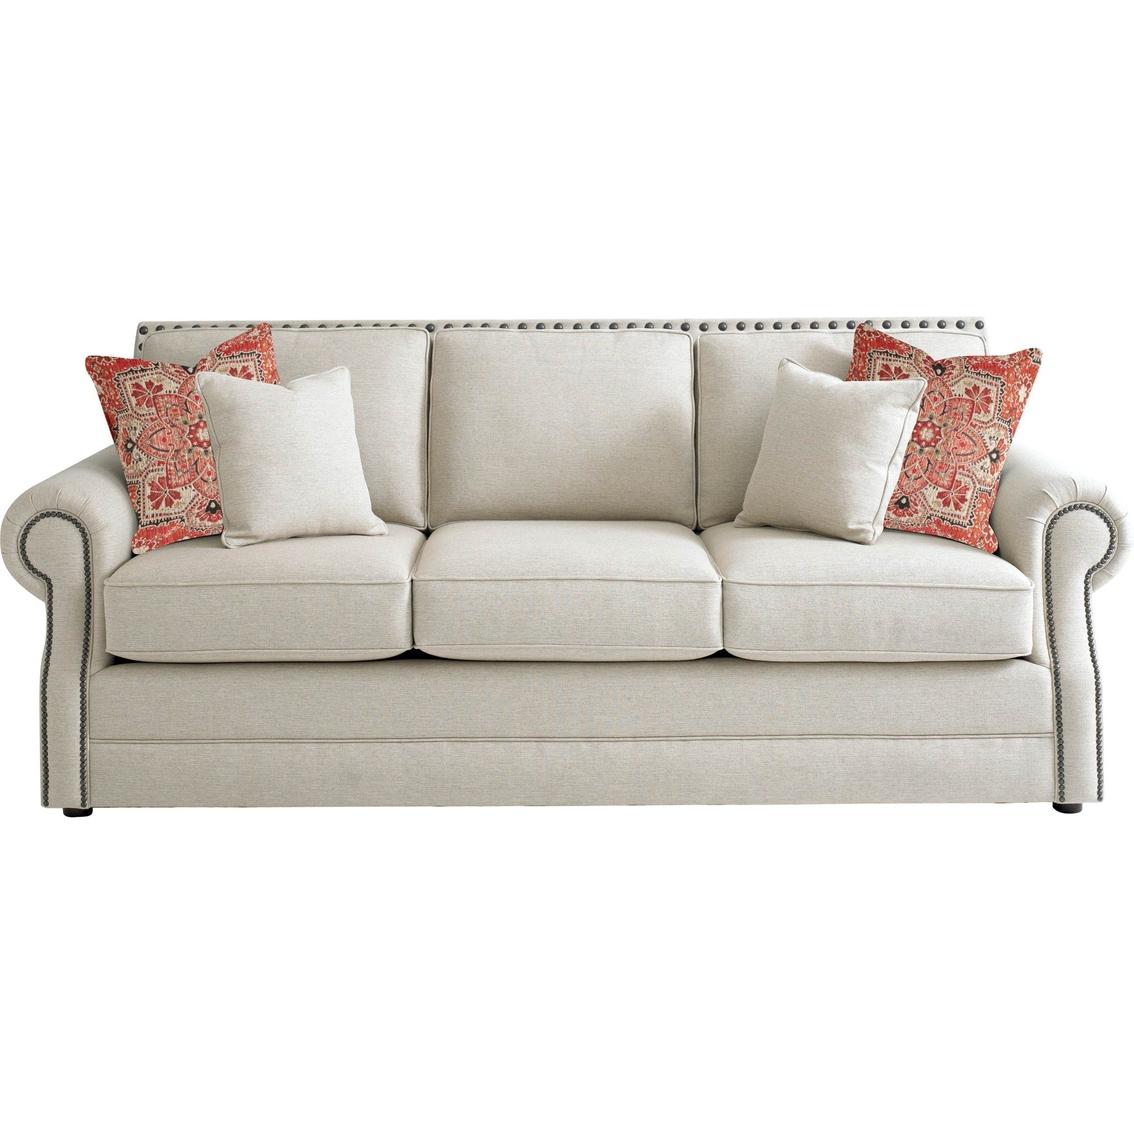 Bassett Couch: Home & Appliances